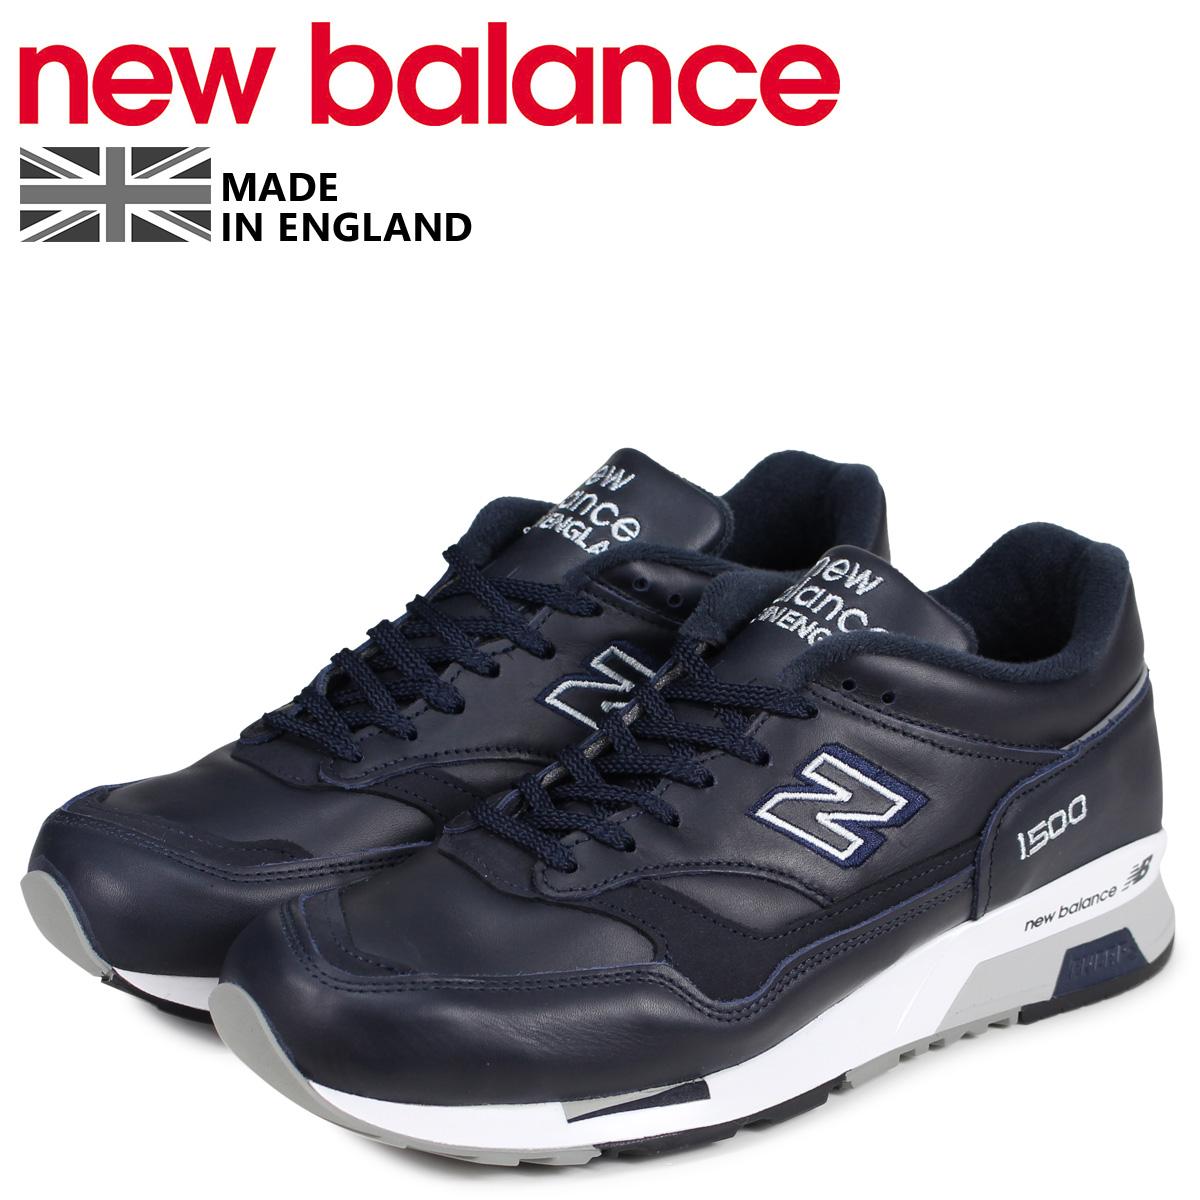 new balance ニューバランス 1500 スニーカー メンズ Dワイズ MADE IN UK ネイビー M1500NAV [4/14 再入荷]